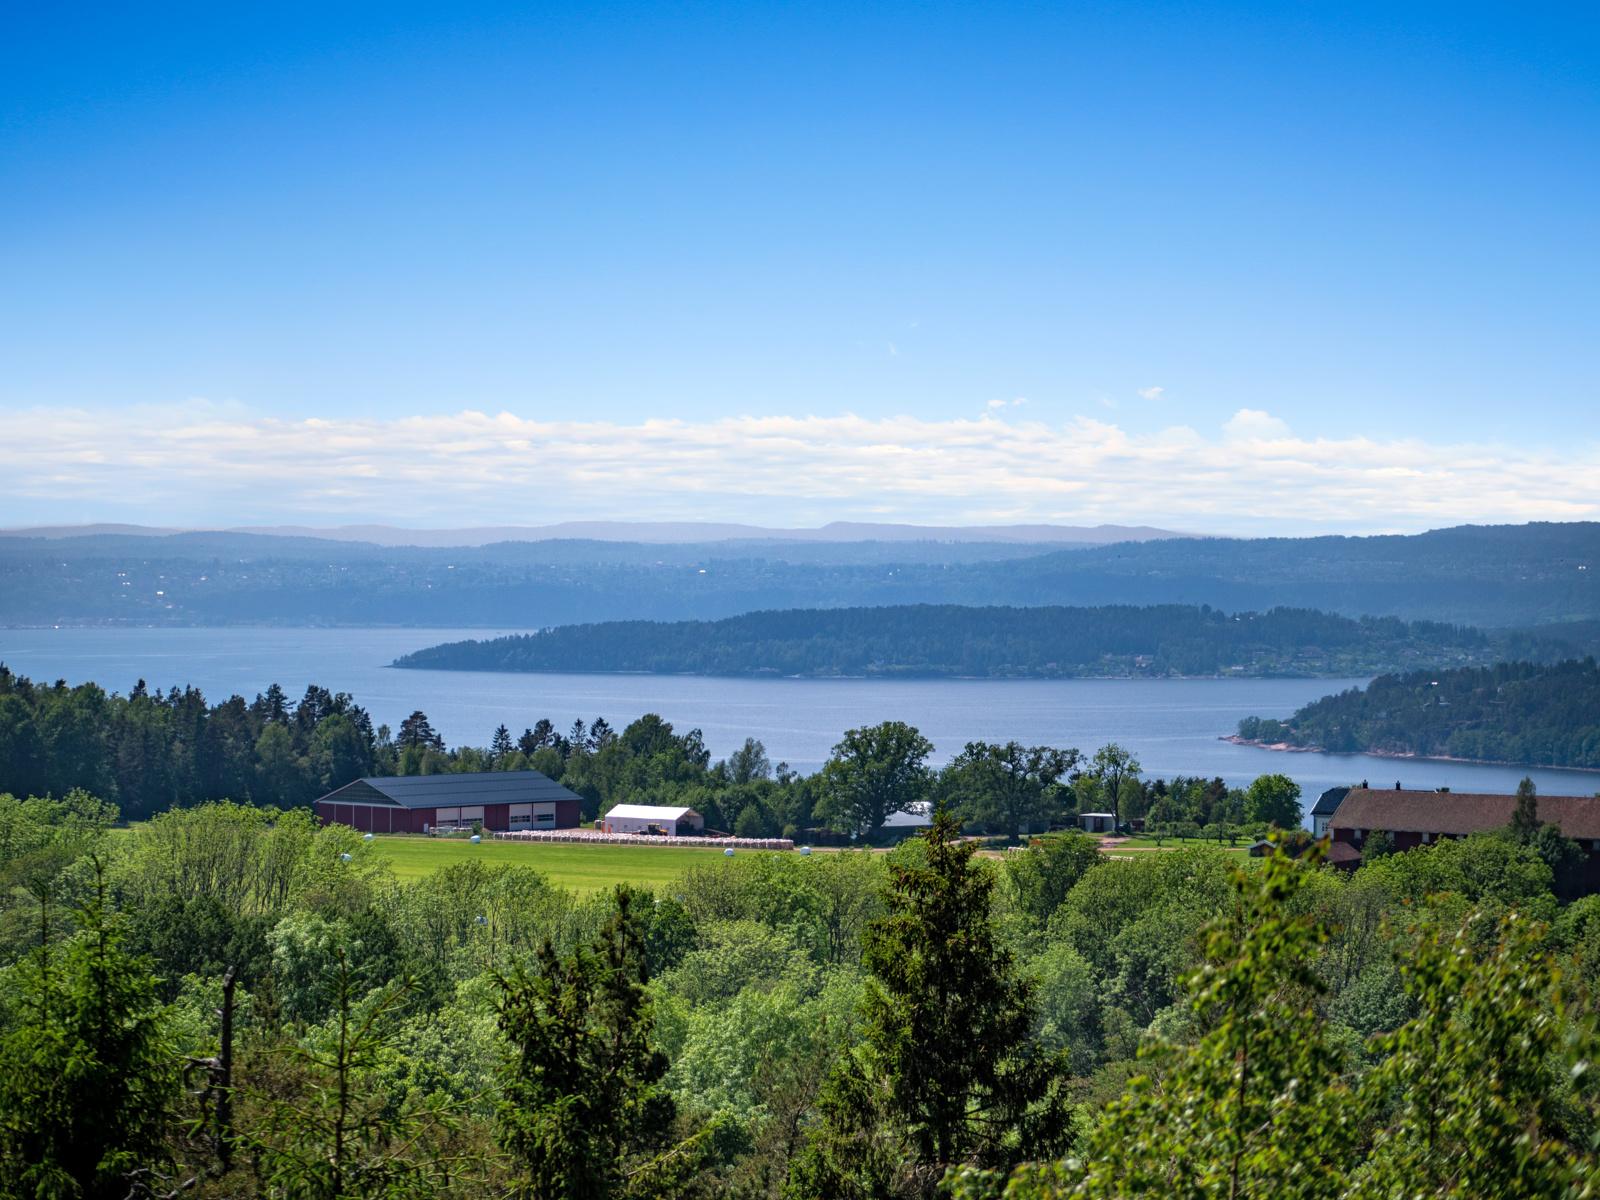 God utsikt over fjorden og omkringliggende områder